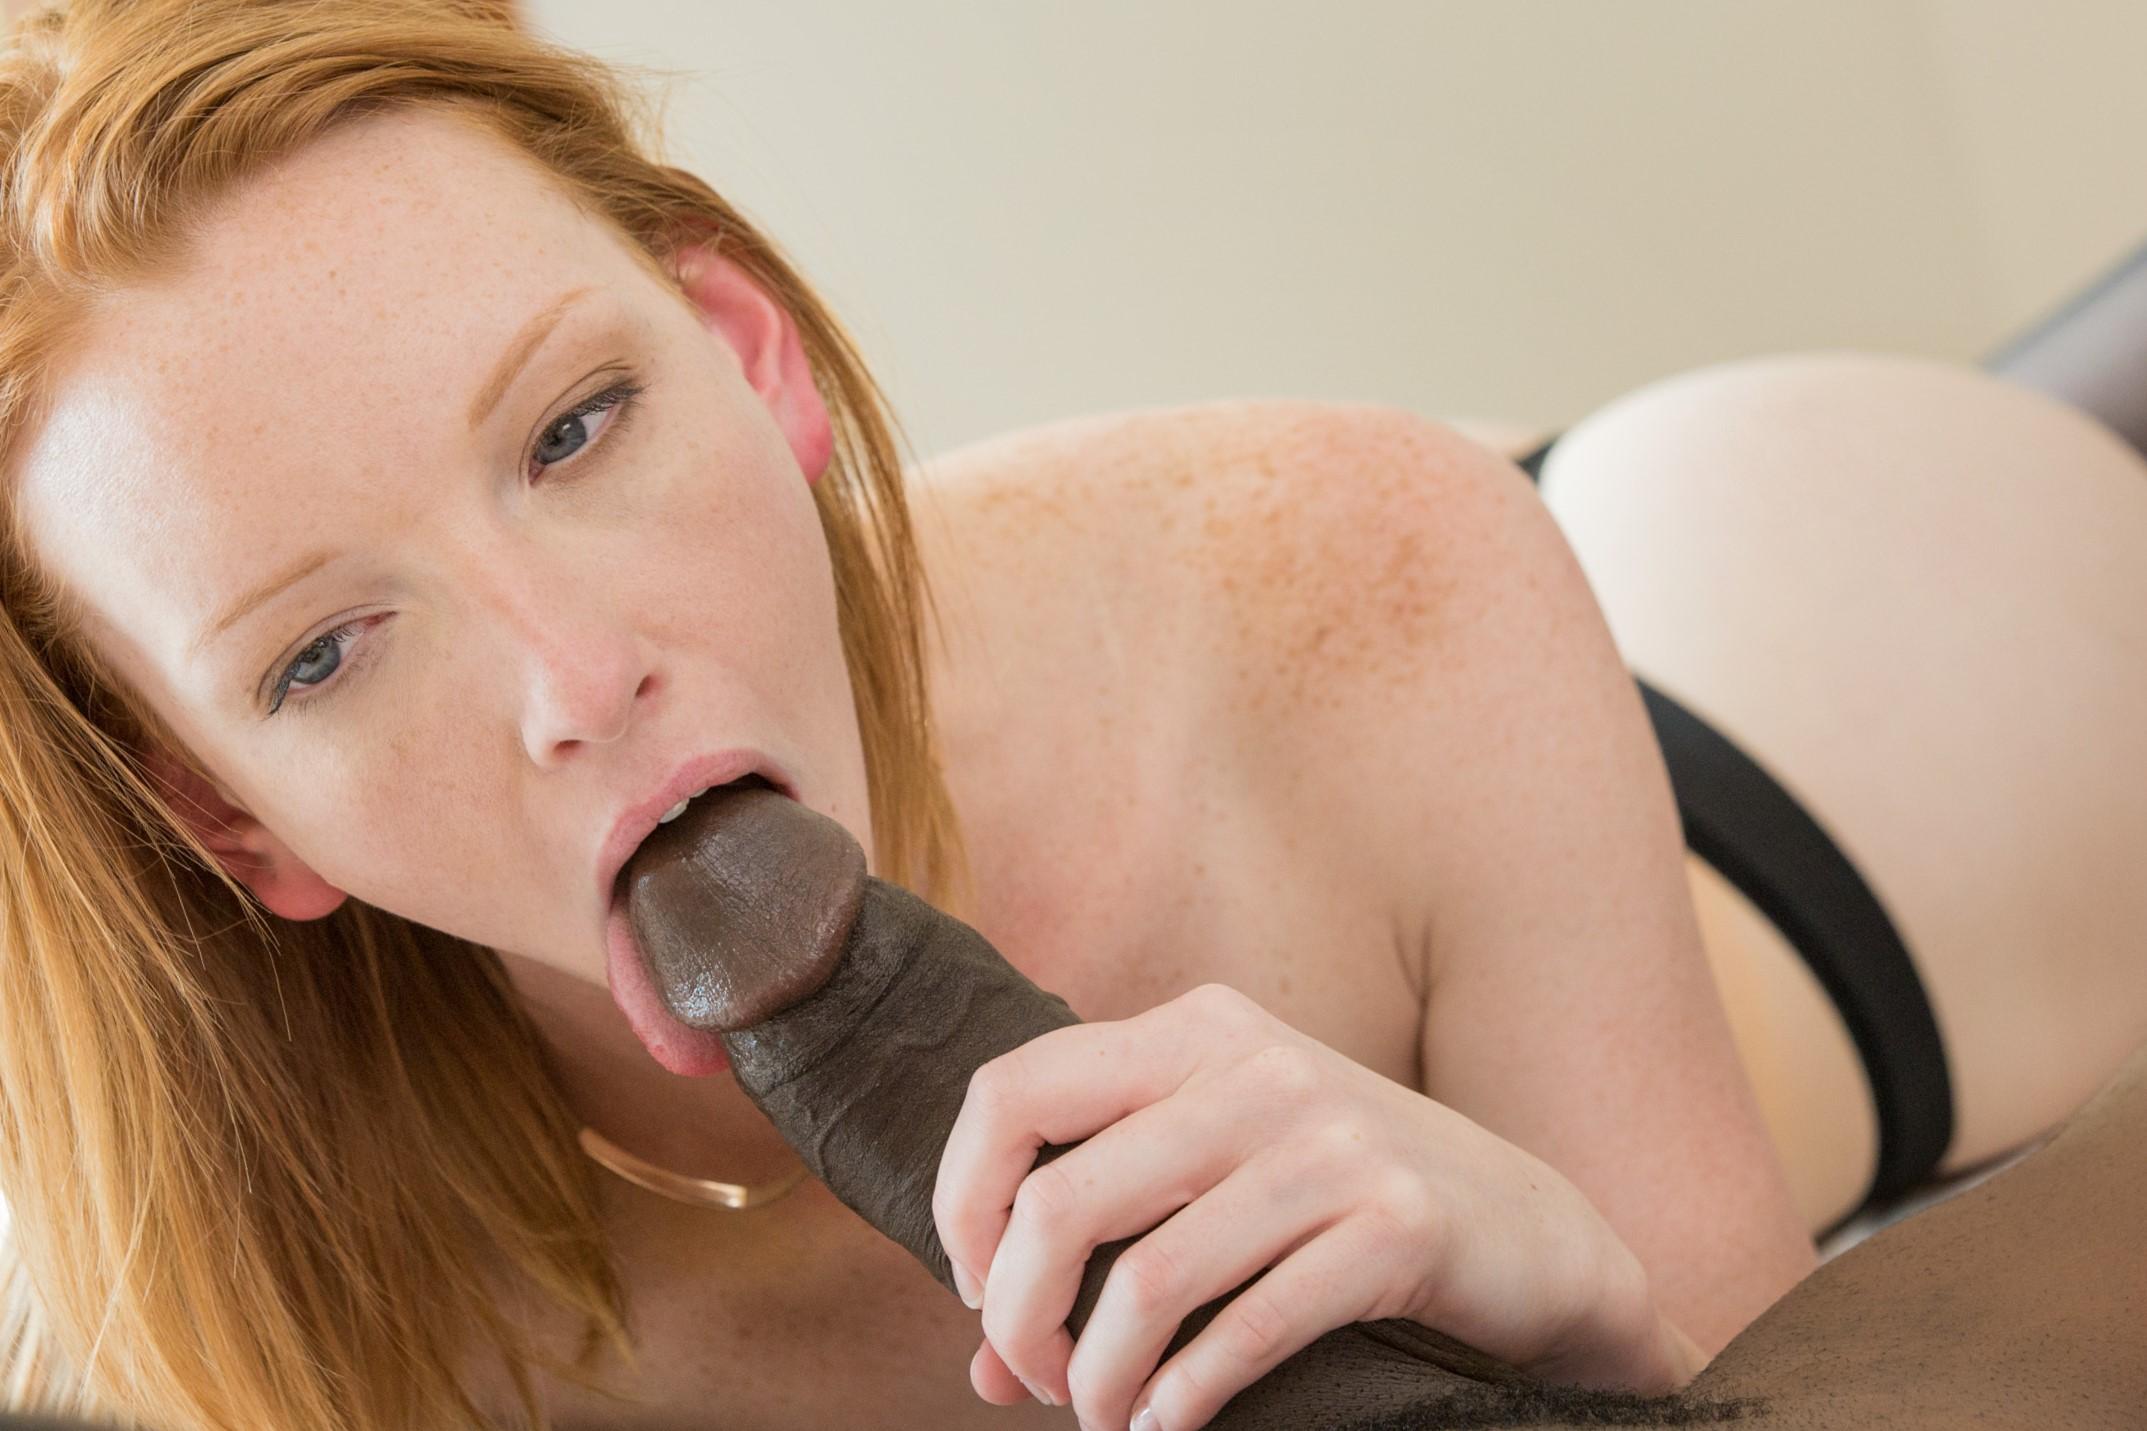 Katy Kiss - A la pelirroja le encanta la verga negra